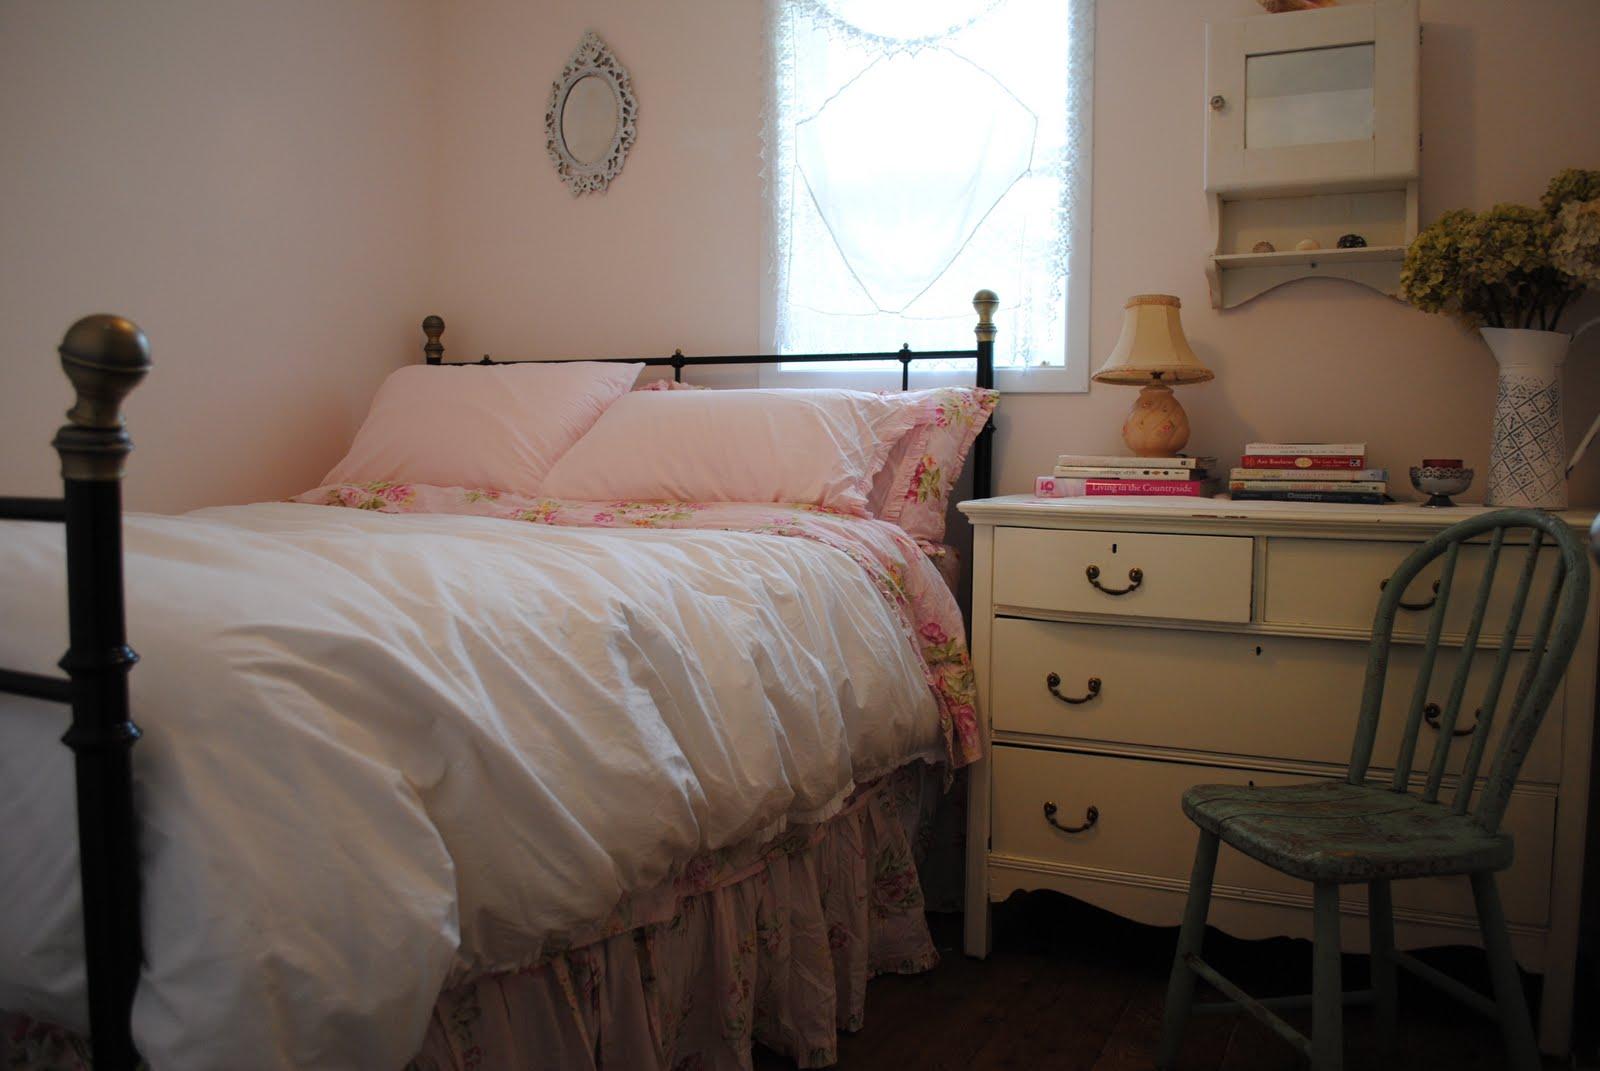 http://3.bp.blogspot.com/_4kErUg2g8lo/S__P4ERpCwI/AAAAAAAACkE/b5rpLIApENU/s1600/bedroom+040.JPG